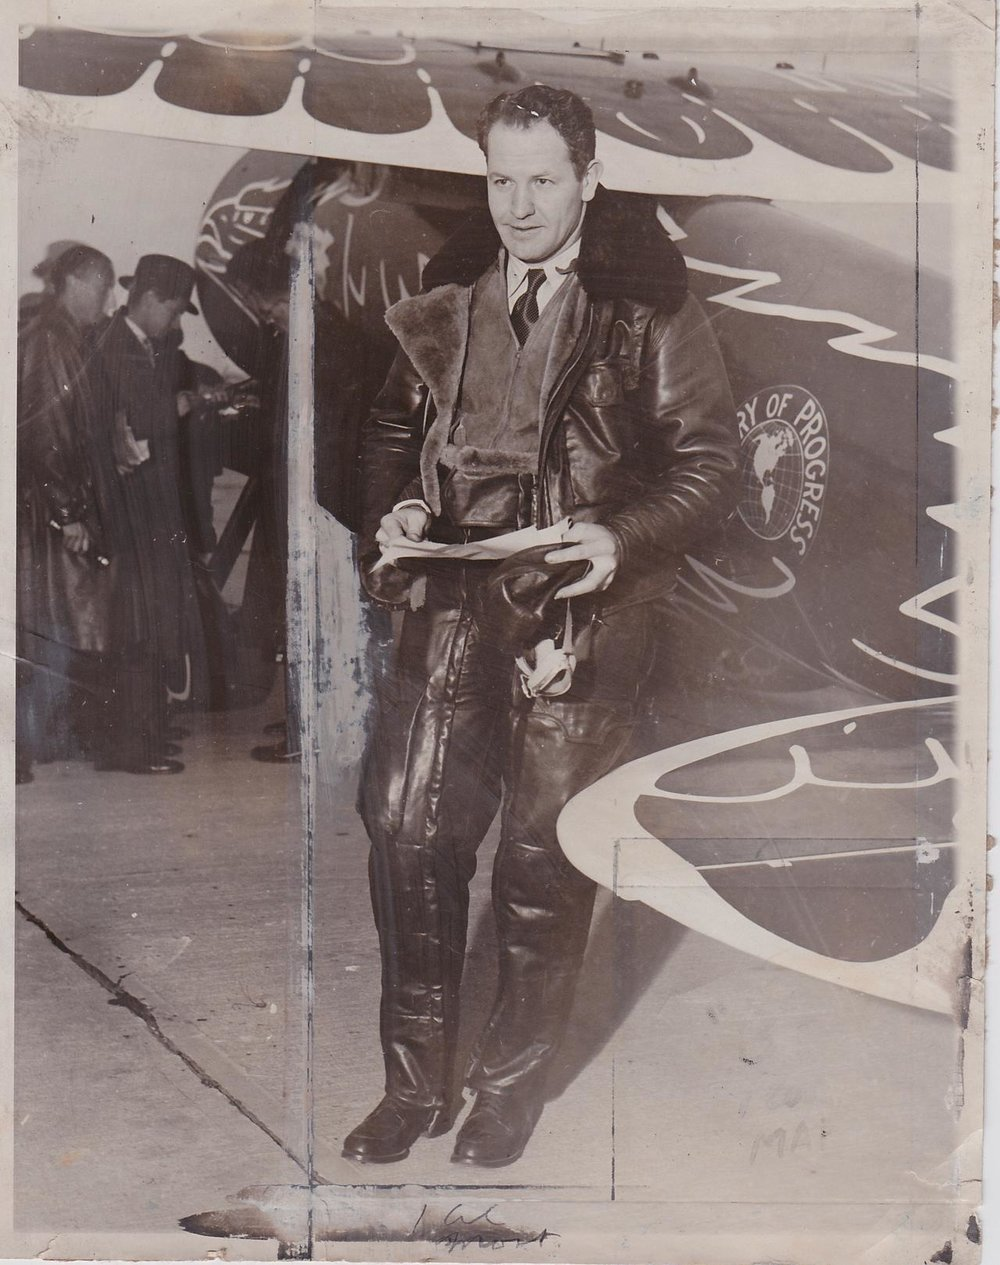 Jimmie Mattern standing next to the Century of Progress. Photo courtesy of adam l. Penenburg